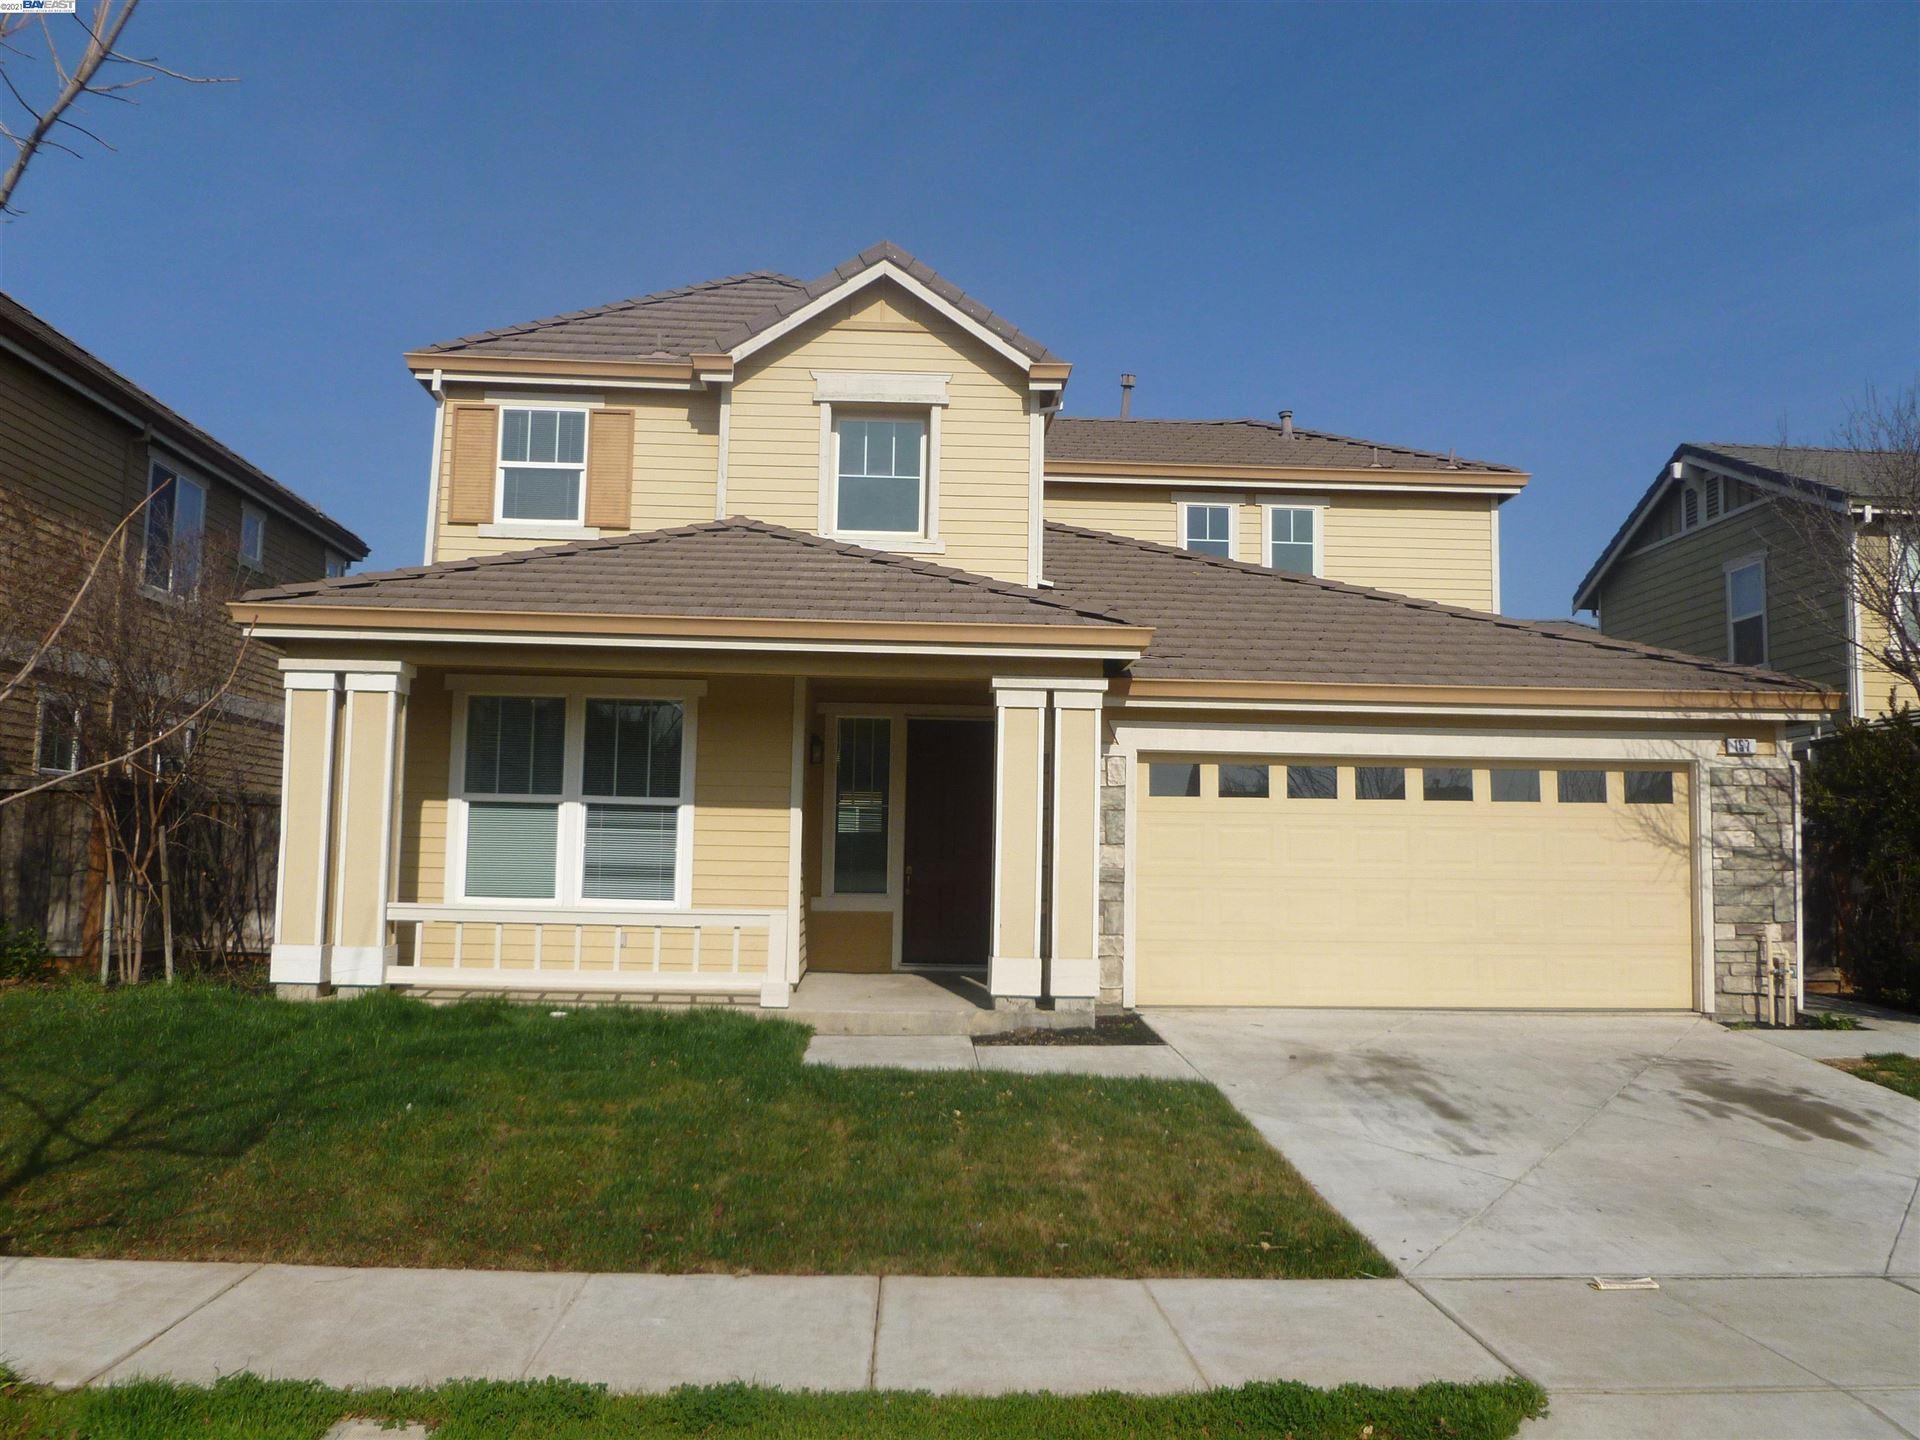 Photo of 157 Trent Pl, BRENTWOOD, CA 94513 (MLS # 40964387)